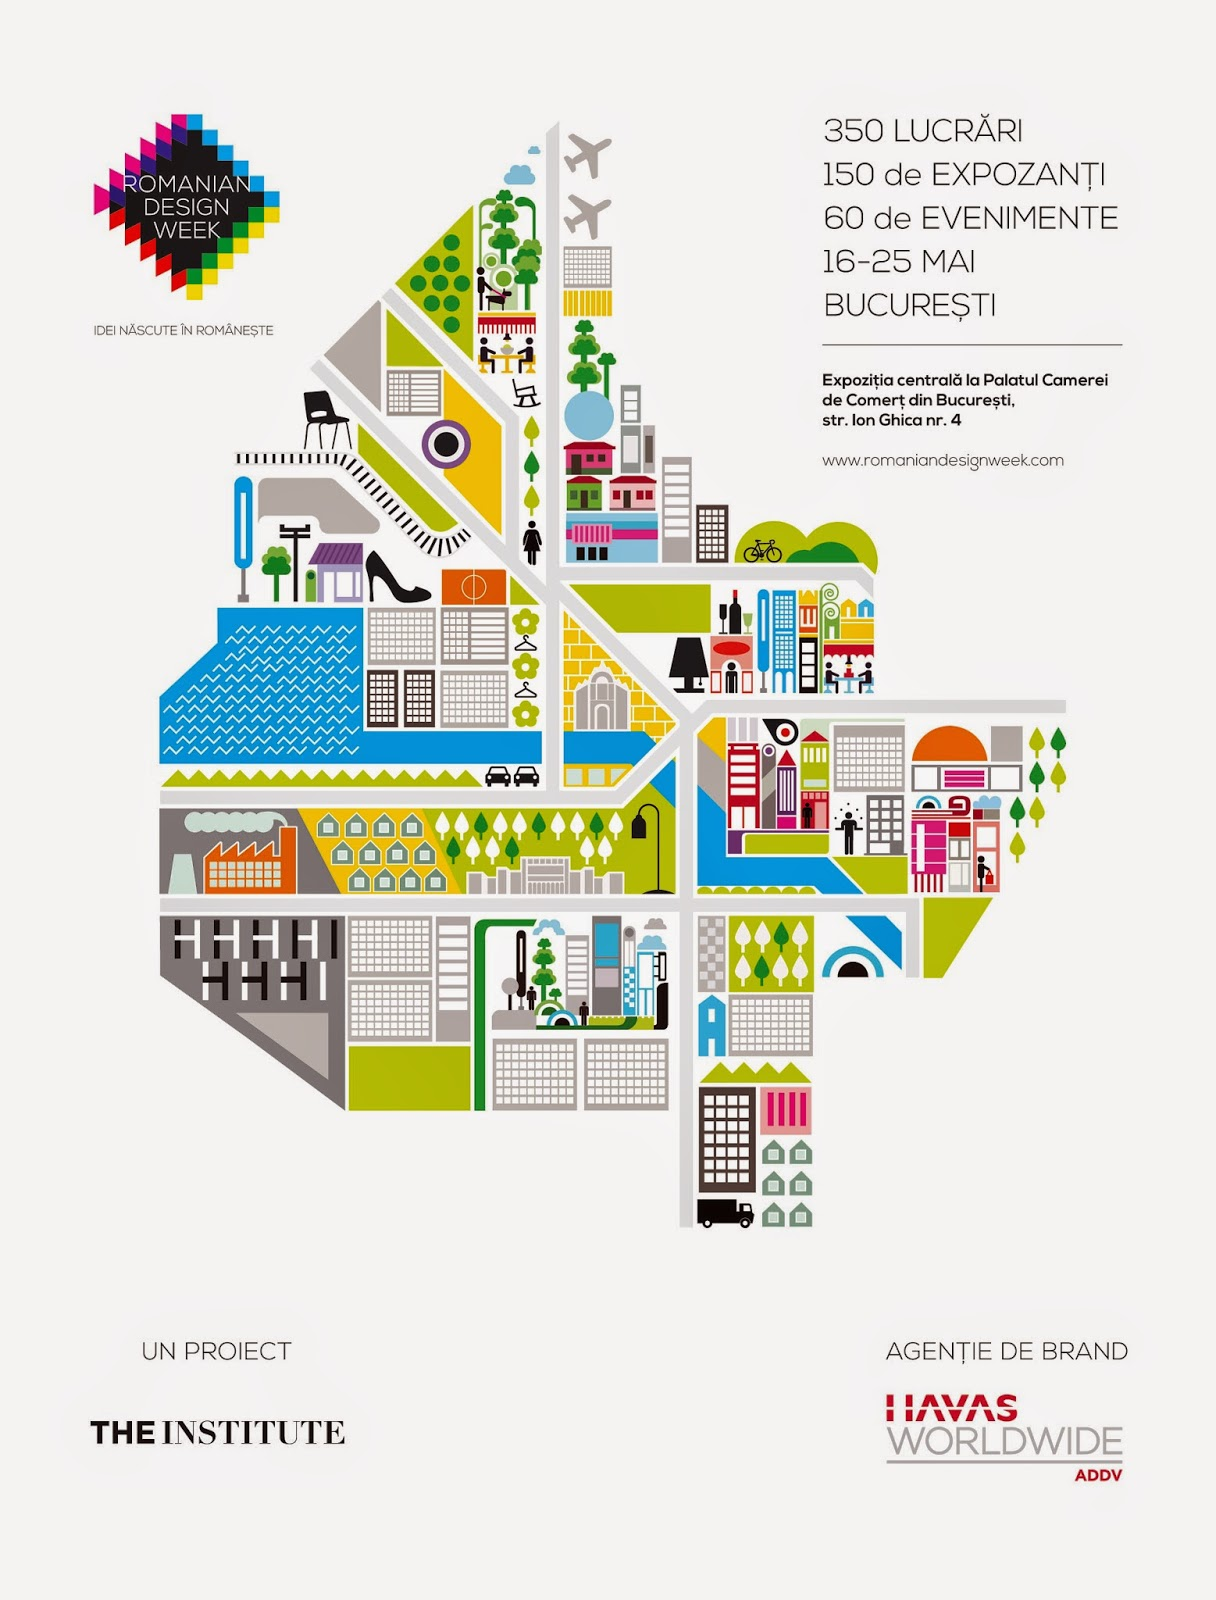 romanian-design-week-2014-anunta